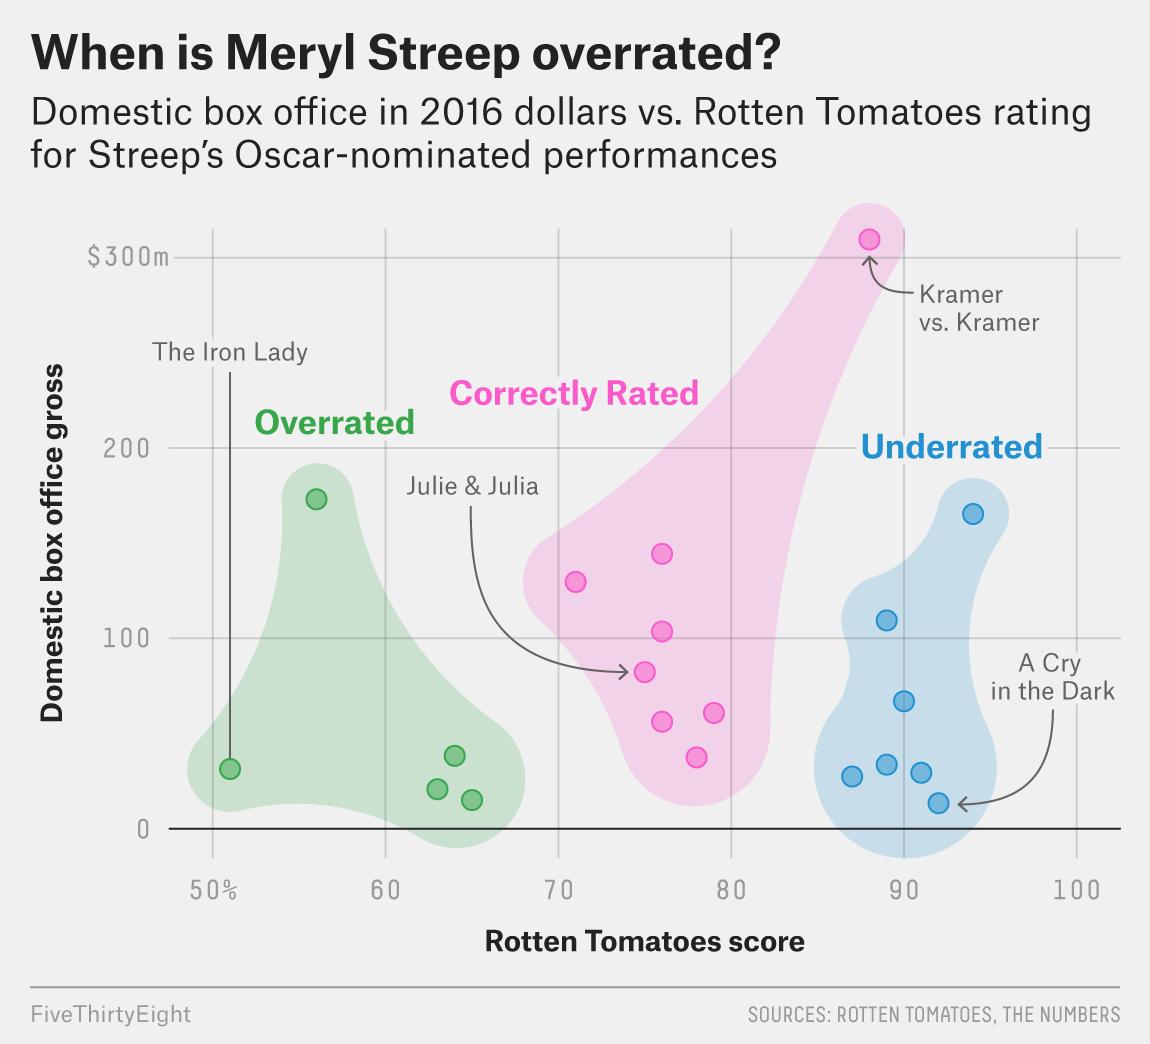 The Three Types Of Meryl Streep Movies | FiveThirtyEight